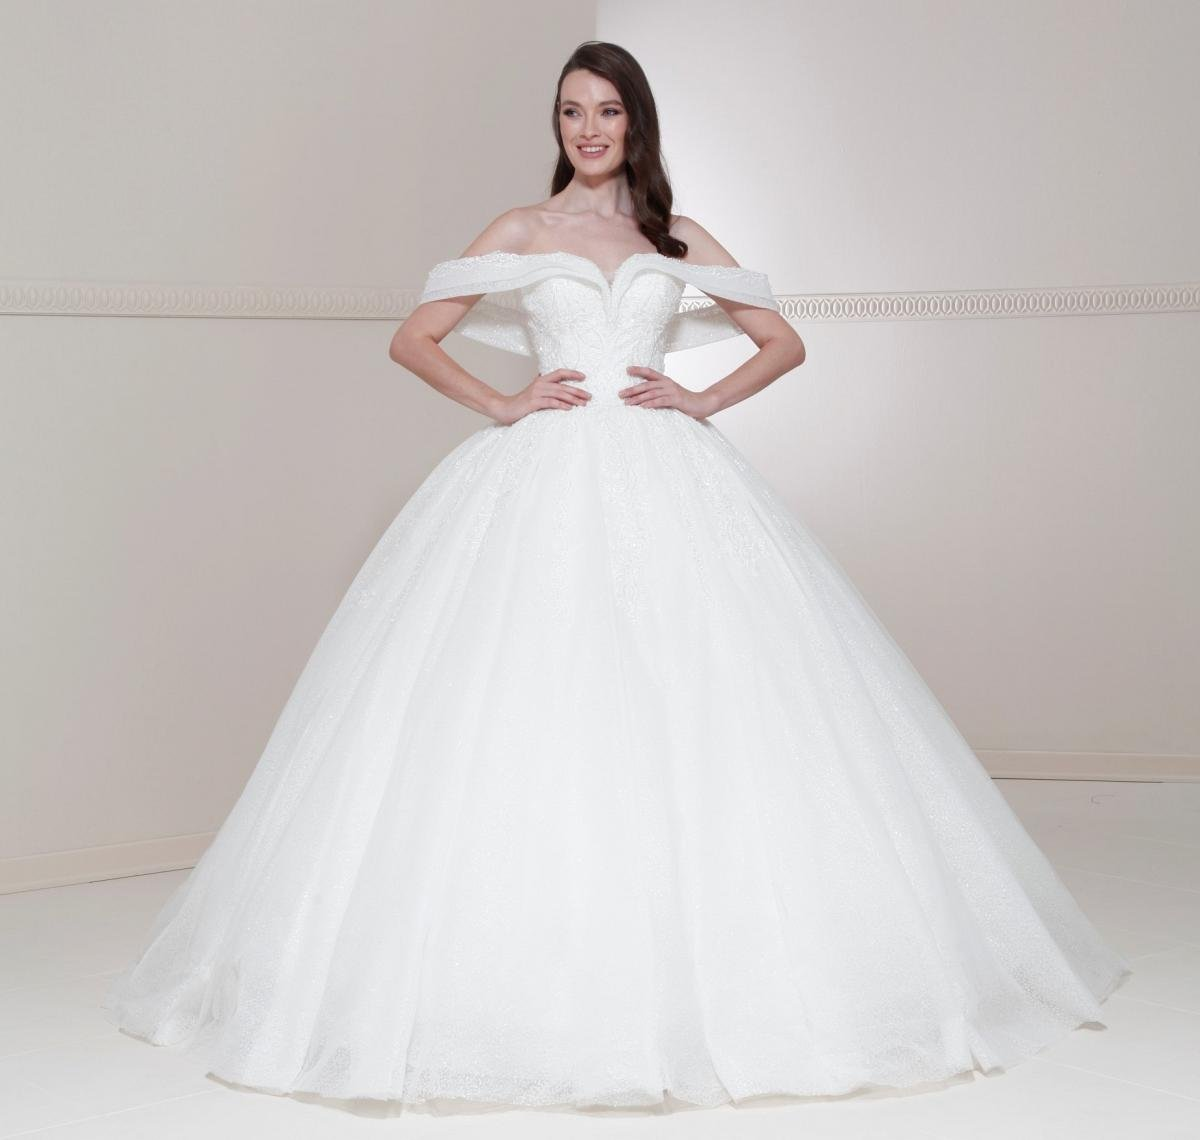 celli-spose-sposa-2022_CRYSTALLINE-BRIDALS-1228-3